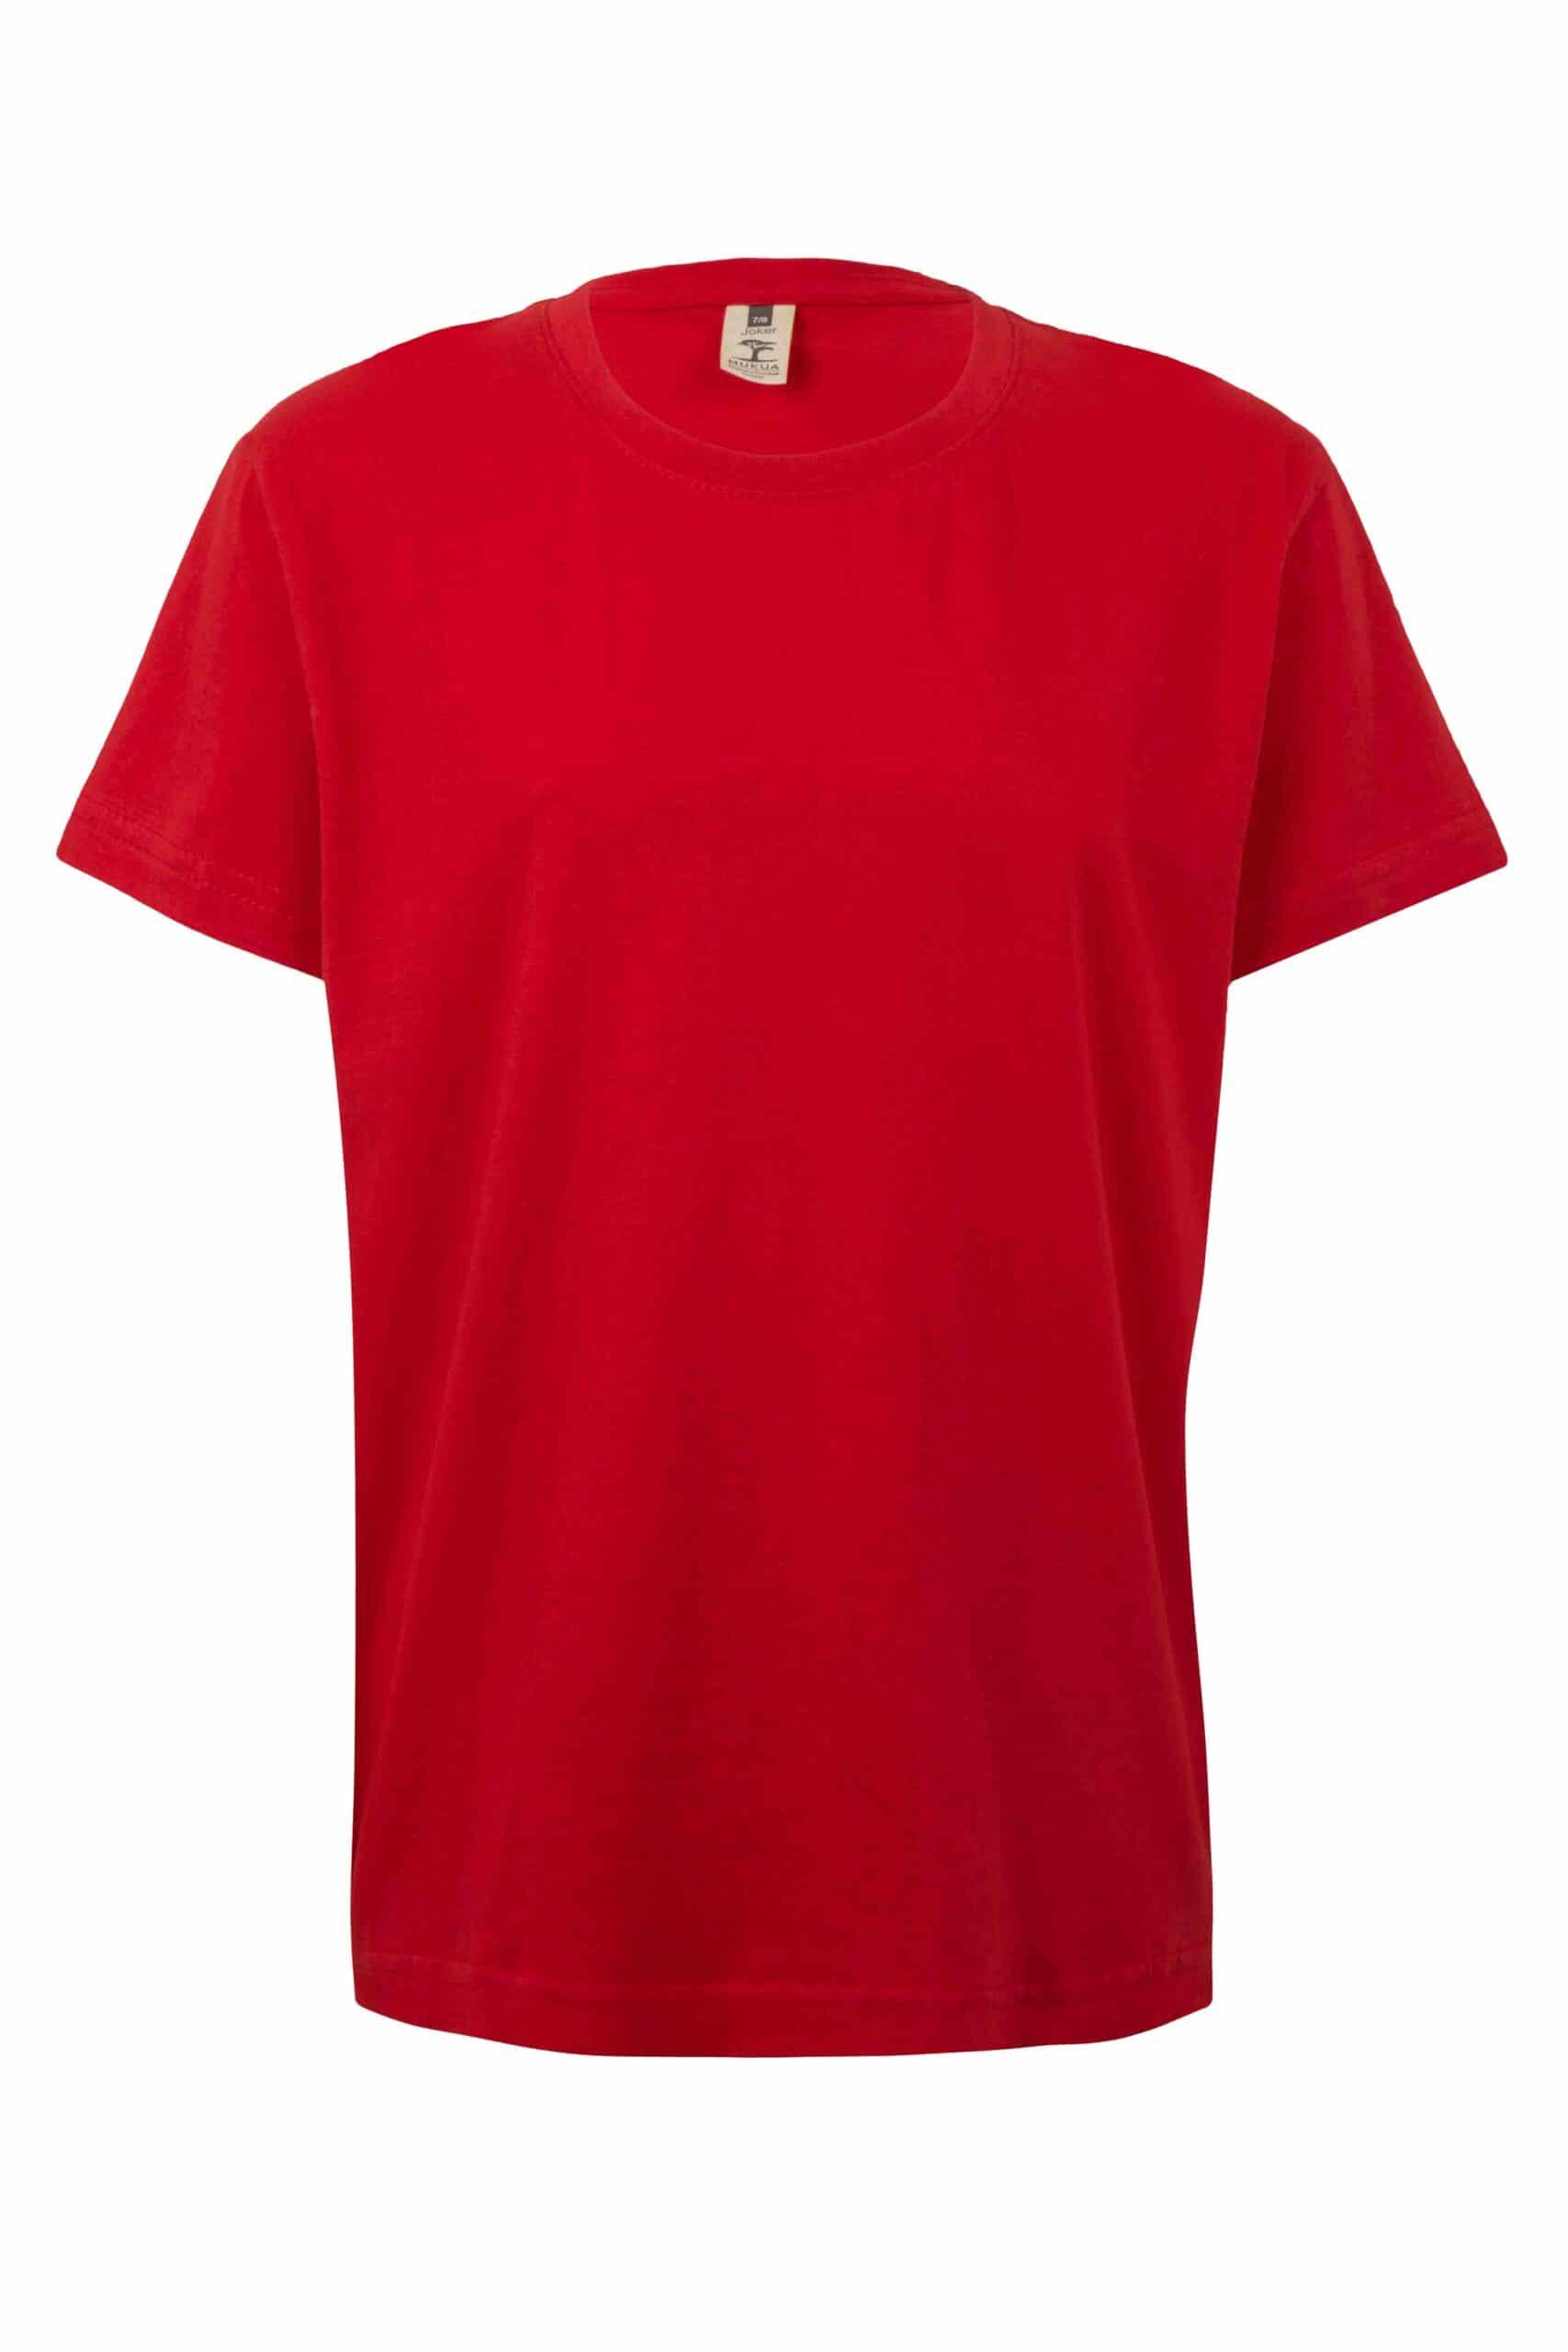 Mukua Mk175cv Camiseta Manga Corta NiÑo Red